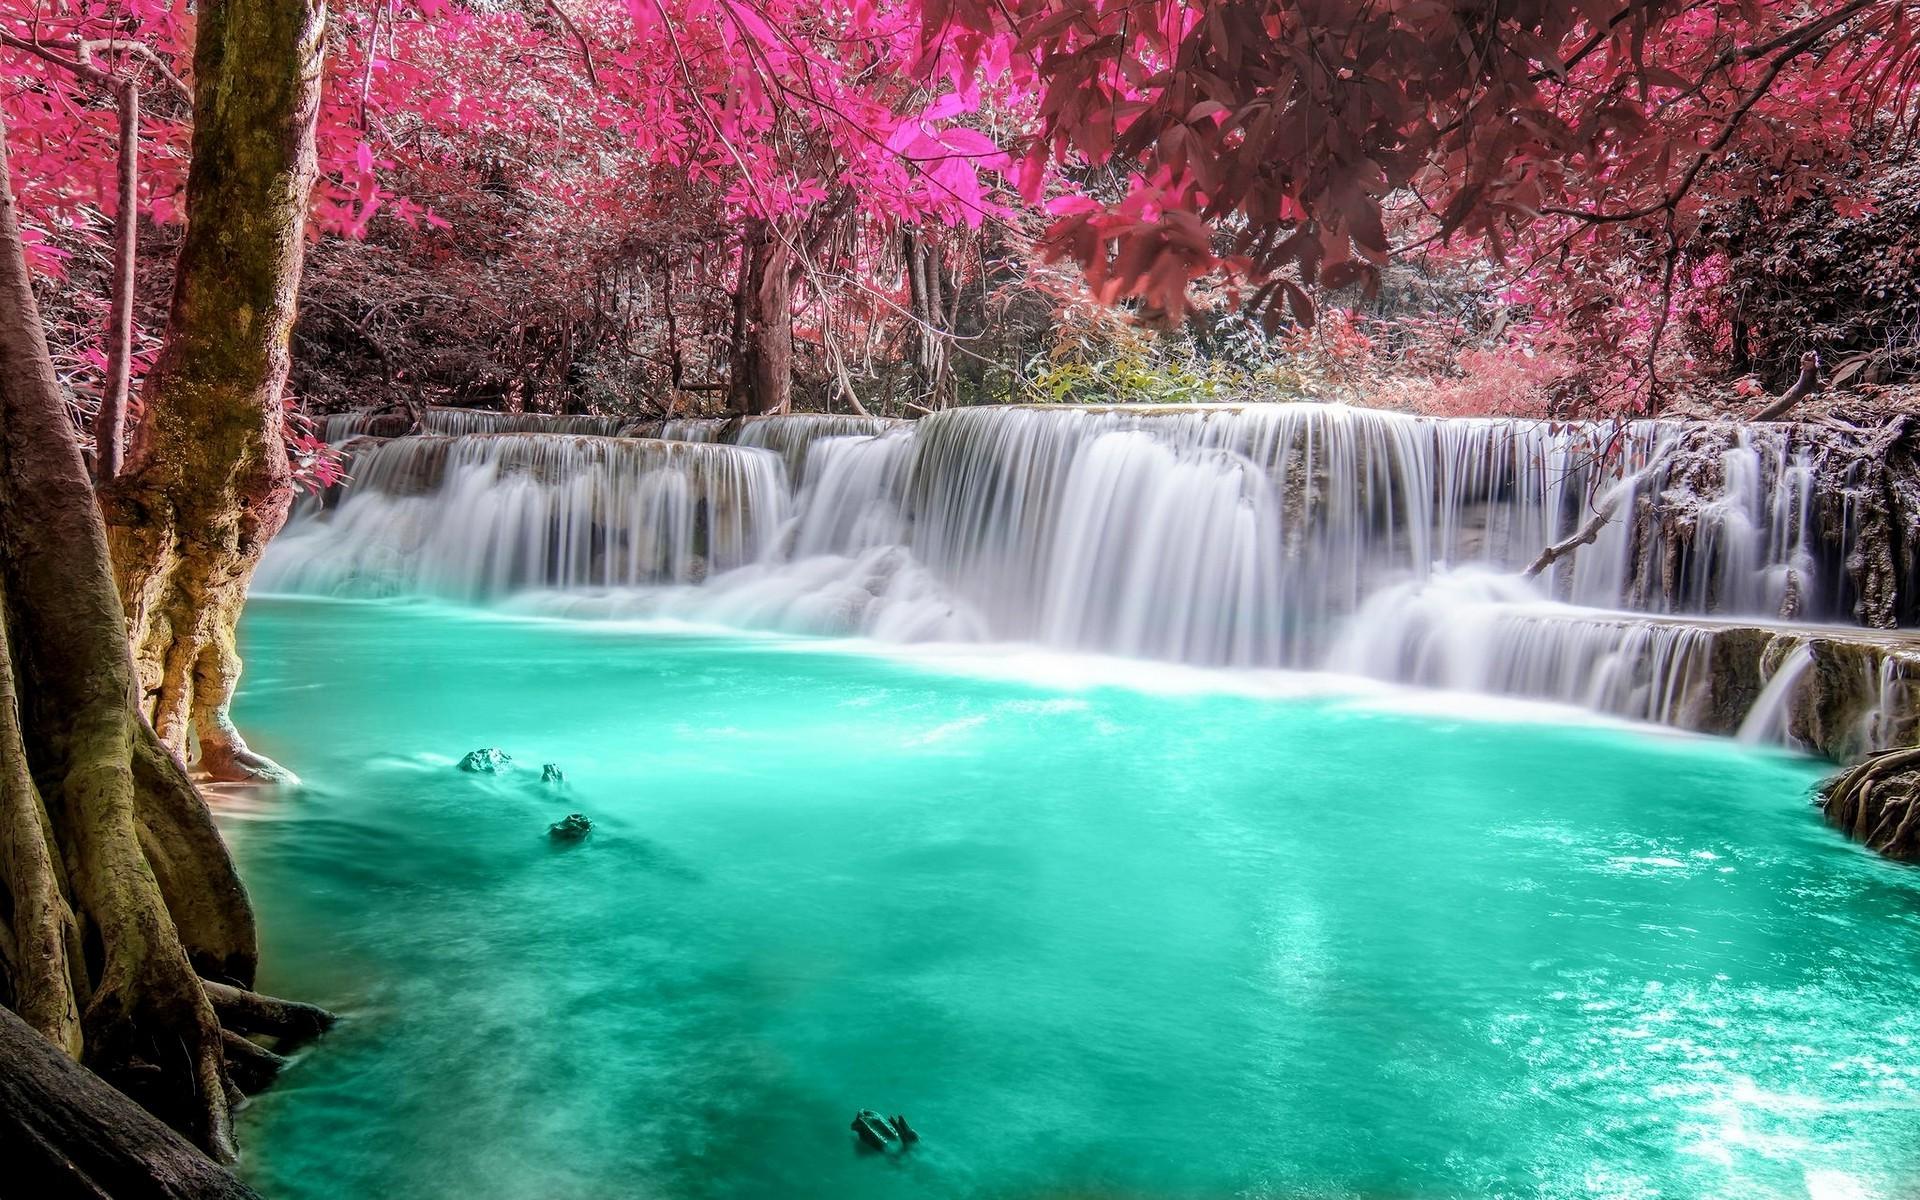 Free Animated Falling Leaves Wallpaper Waterfall Desktop Wallpaper 183 ①